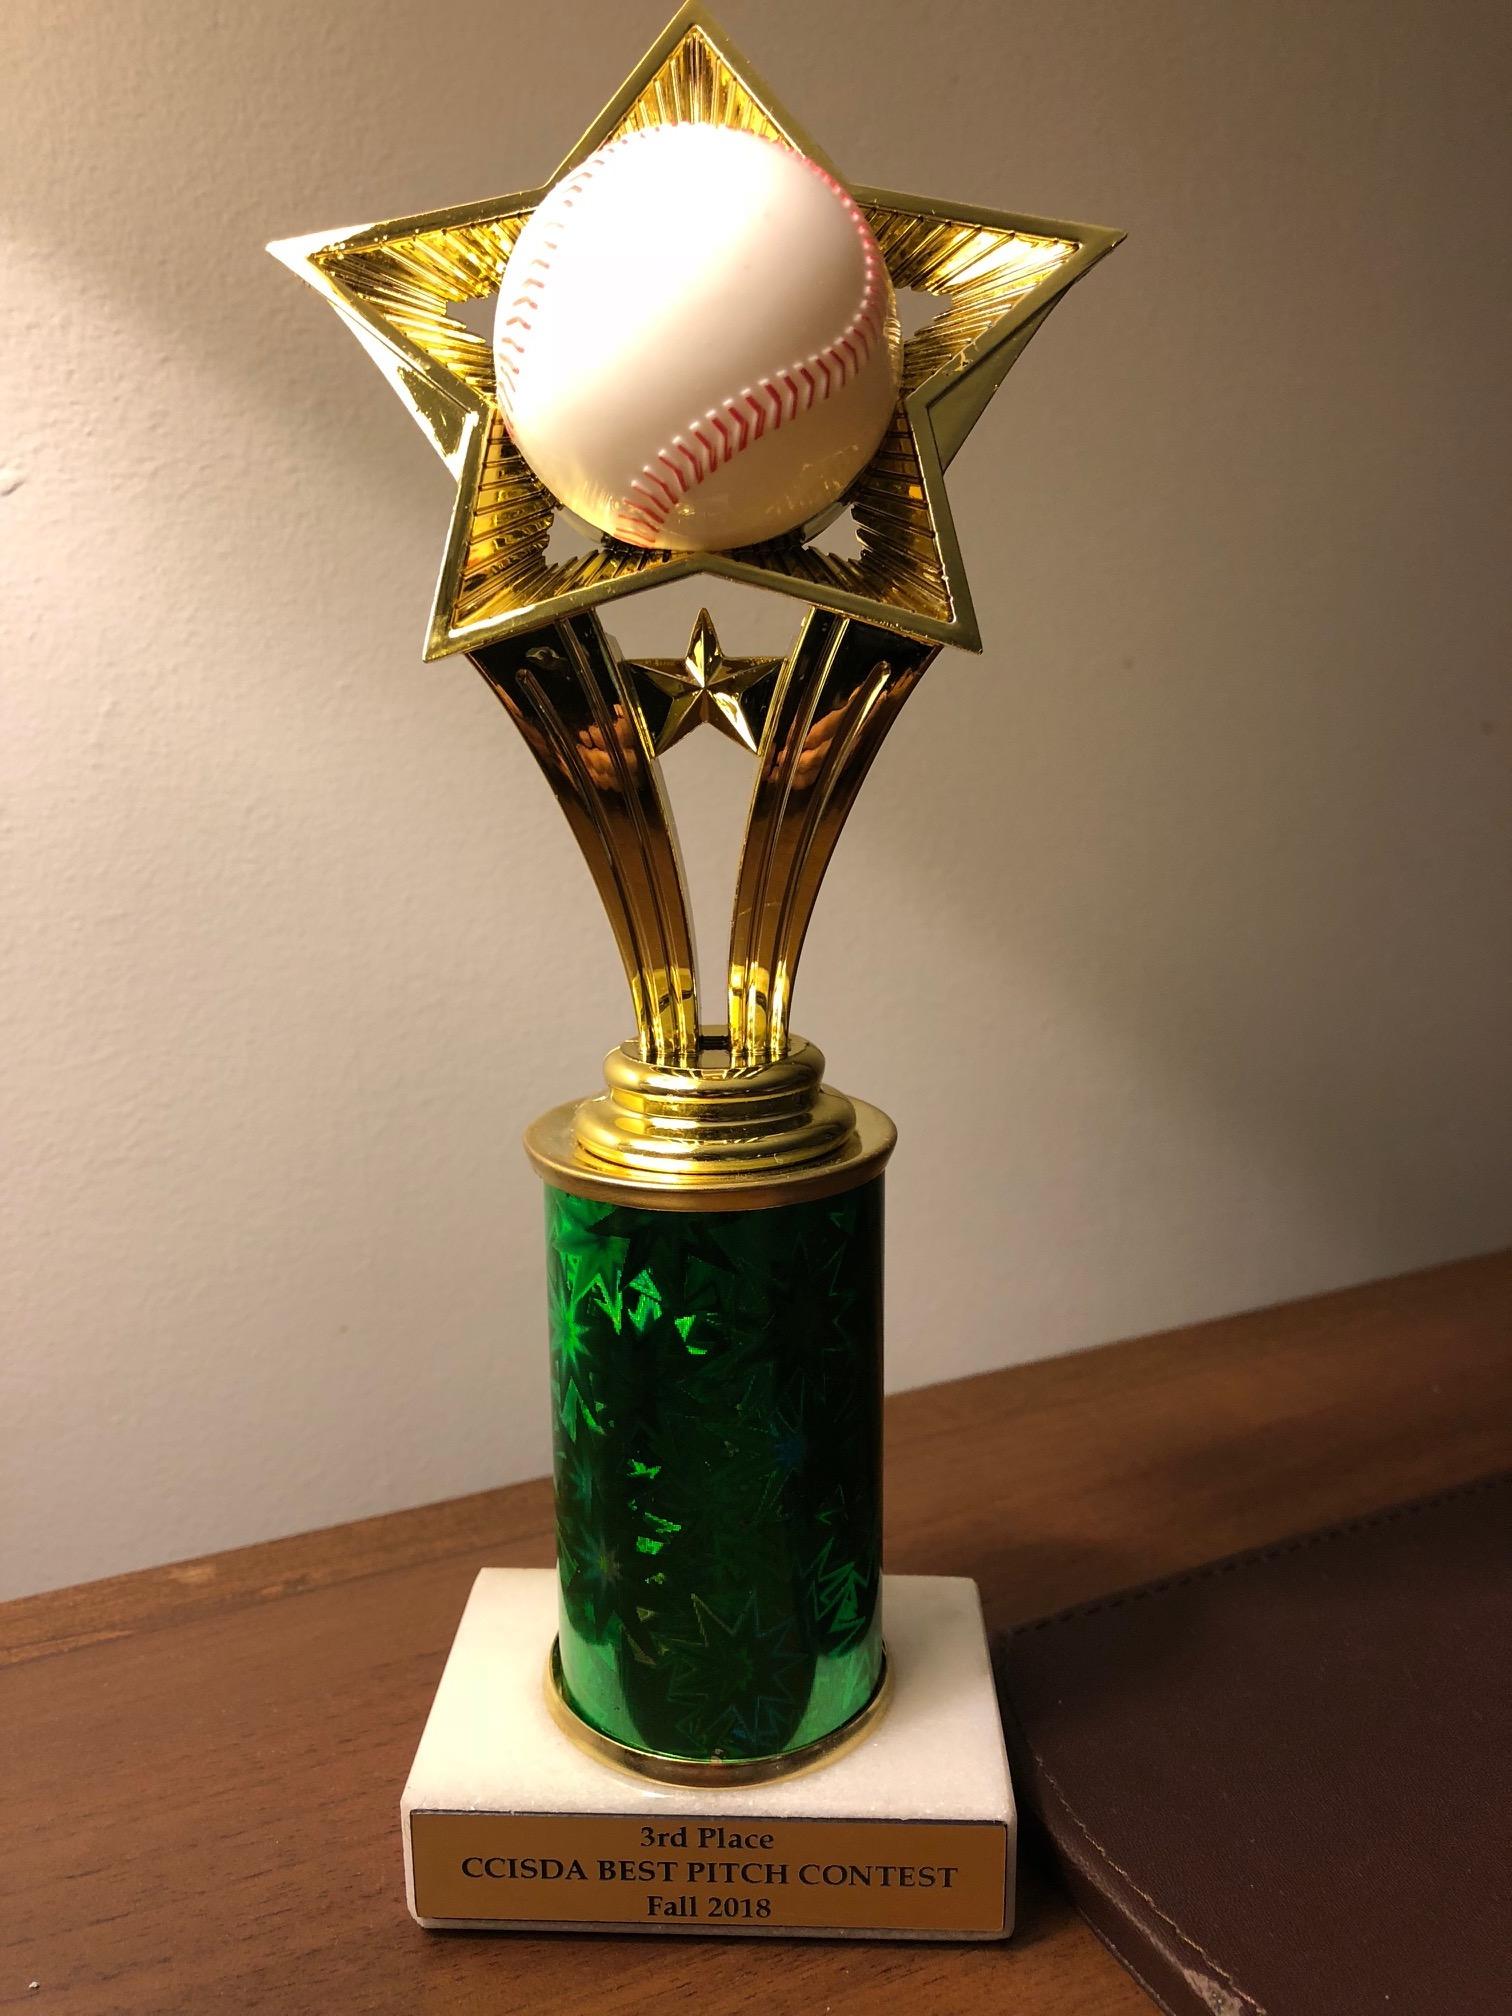 CSSISDA Best Pitch Contest